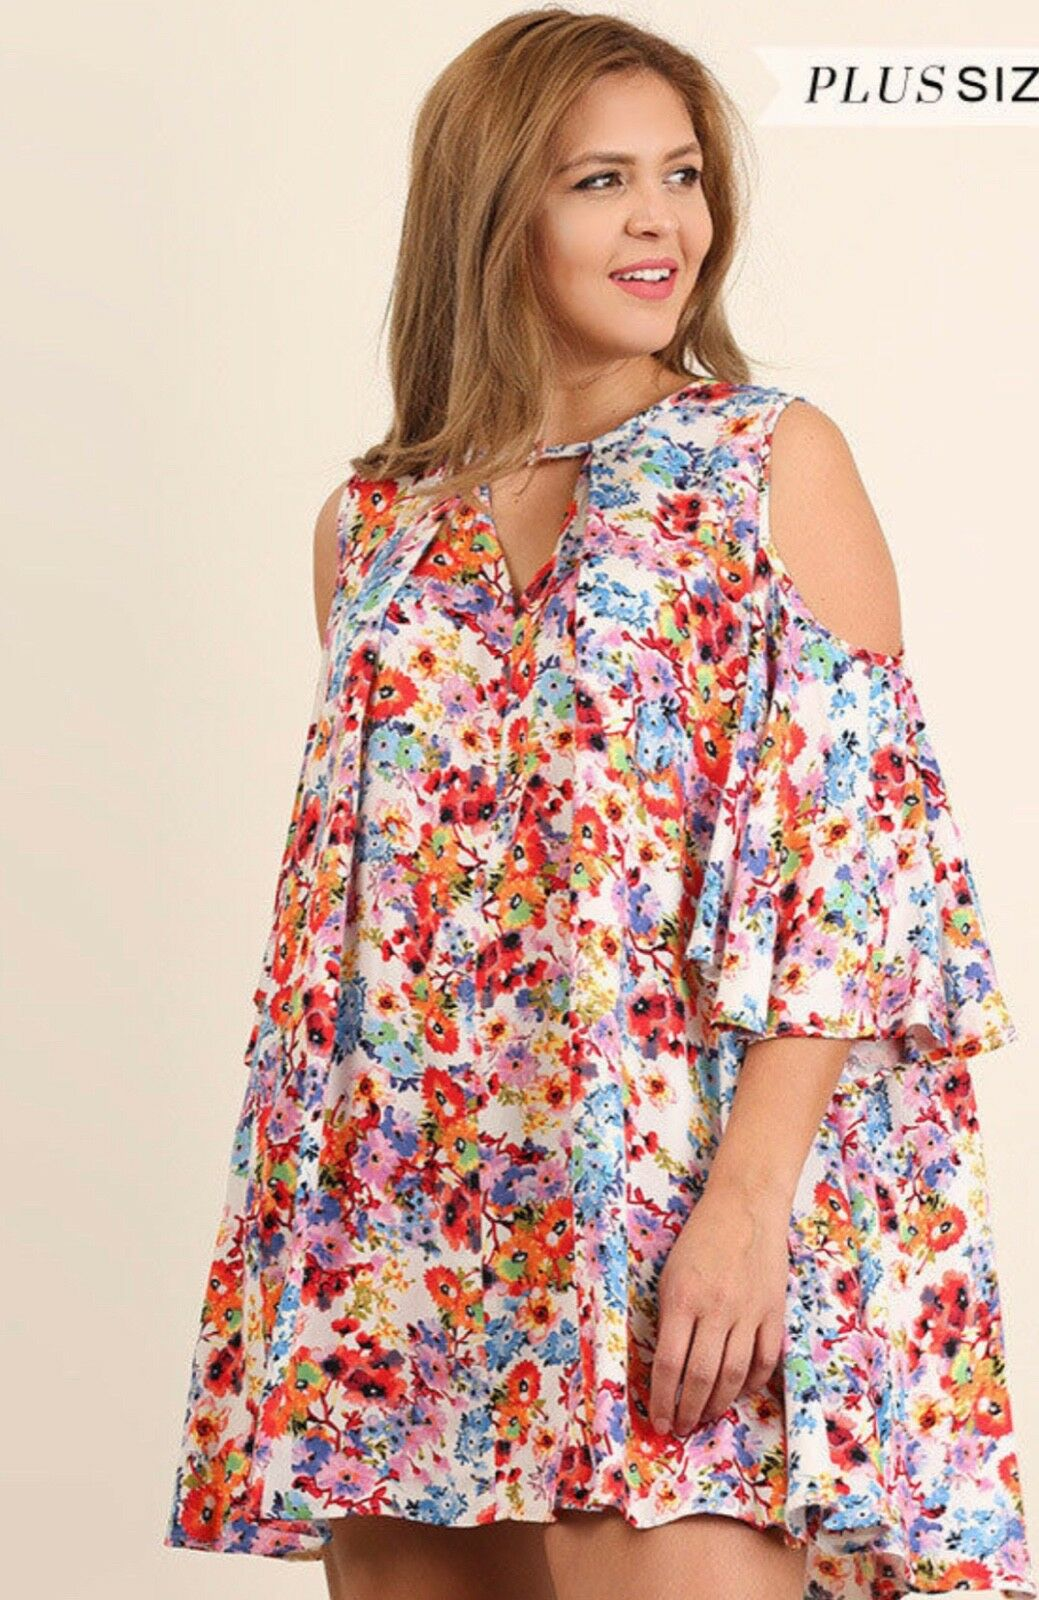 New Umgee Boho Open Shoulder Floral Keyhole Back Dress Tunic Top Plus 1XL 1X